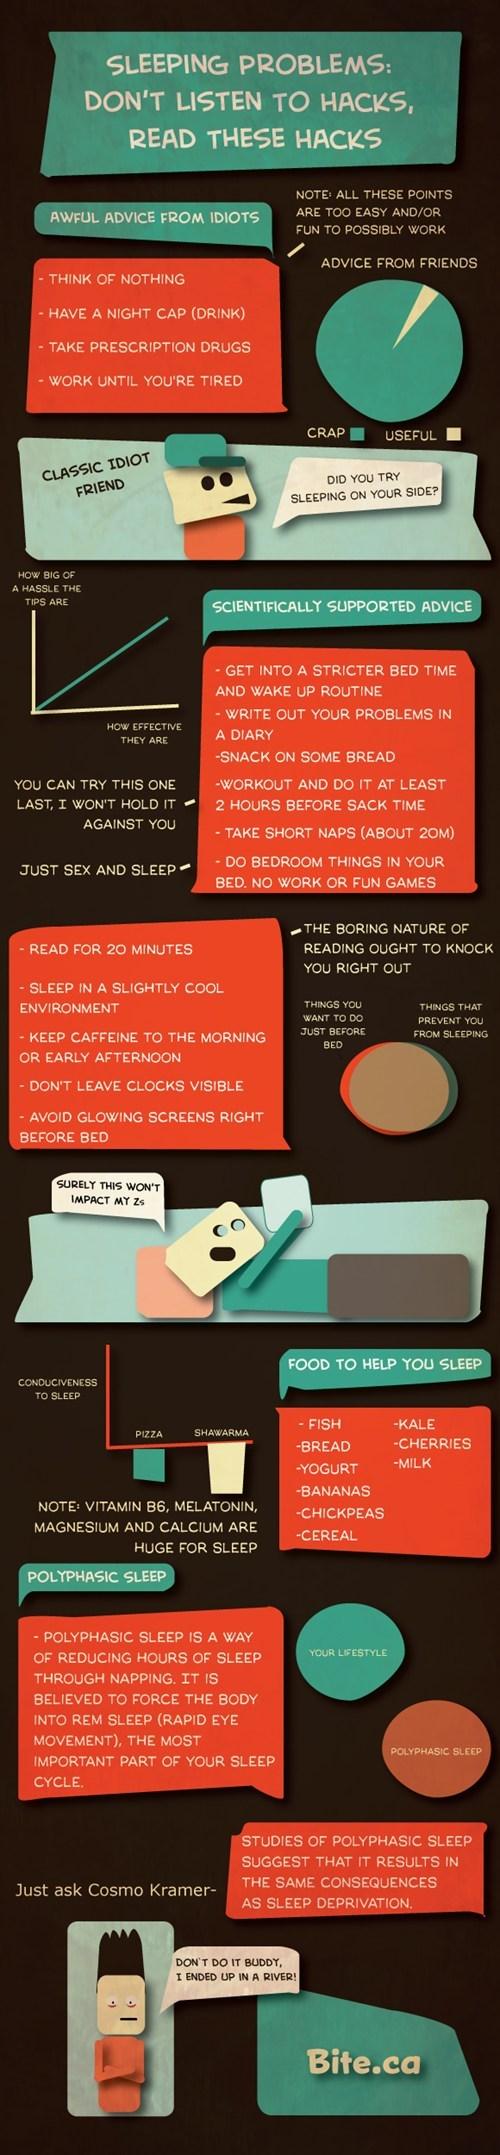 hacks,idiot friends,sleep,infographic